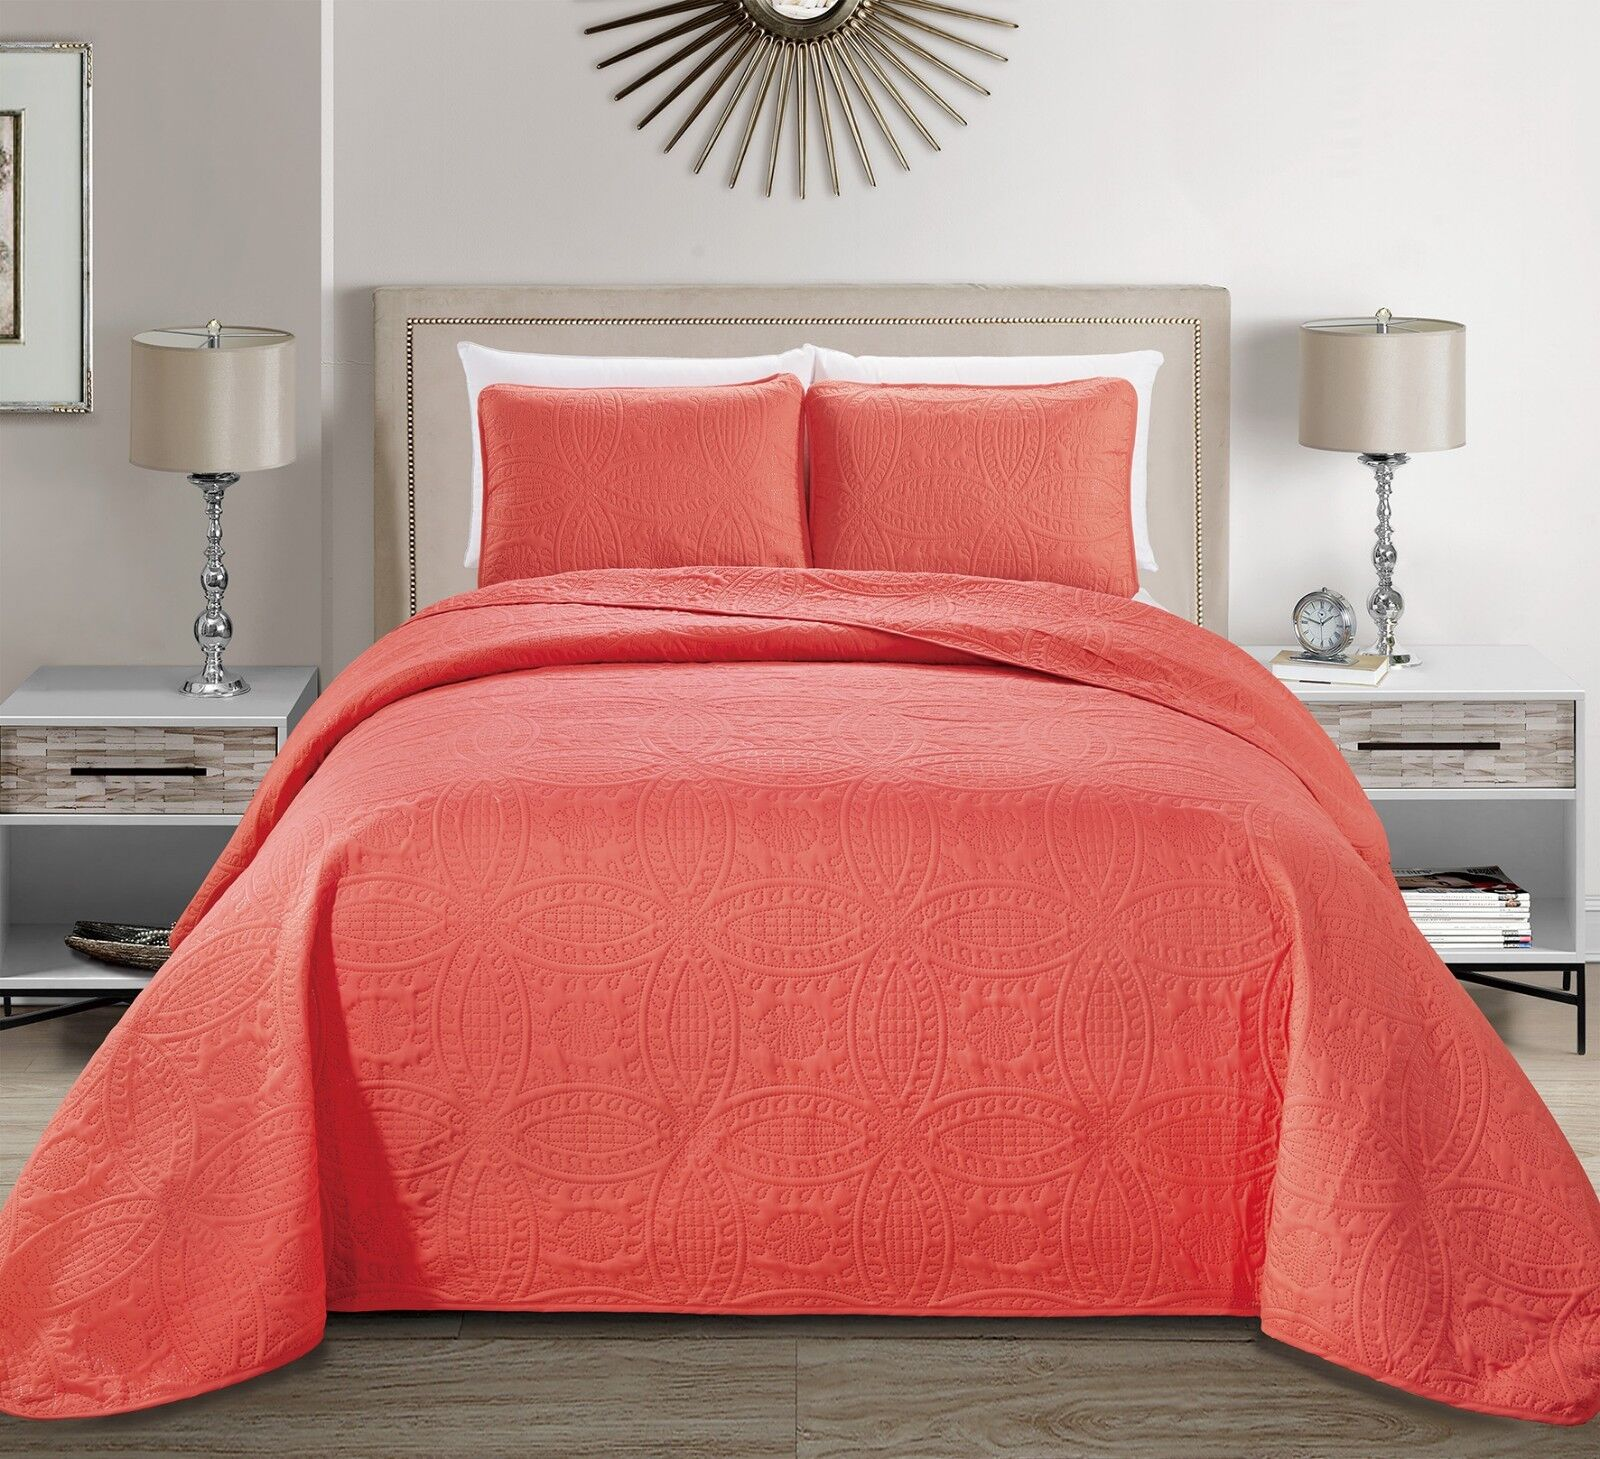 Fancy Linen Embossed Oversized Coverlet Bedspread Set Coral